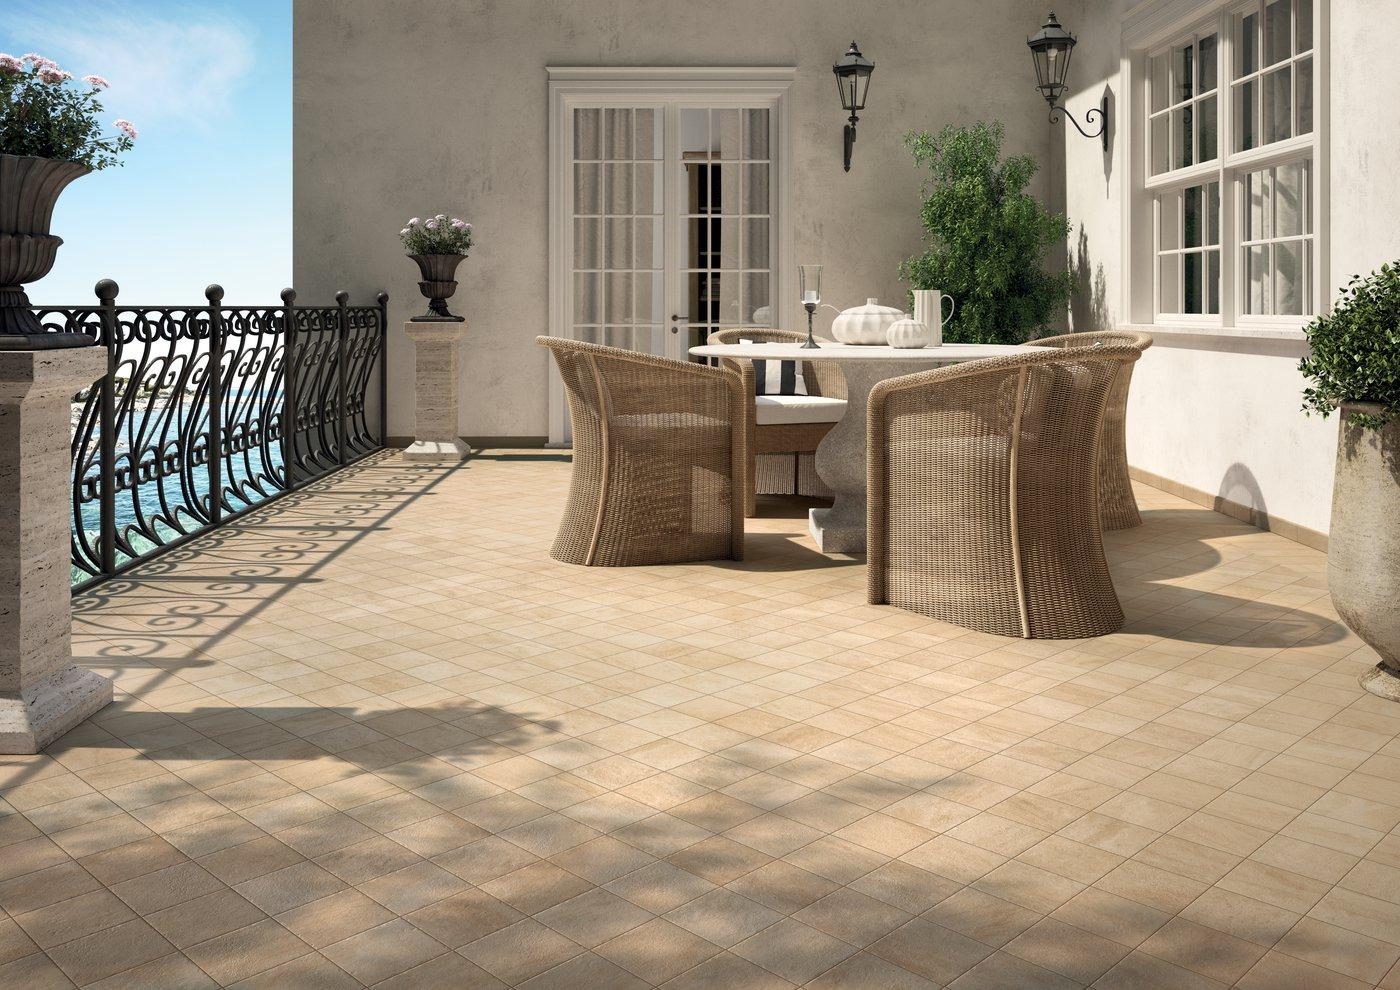 outdoor tiles, floor outdoor tiles, outdoor tiles bunnings, textured tiles, balcony tiles, pool coping tiles; pool tiles